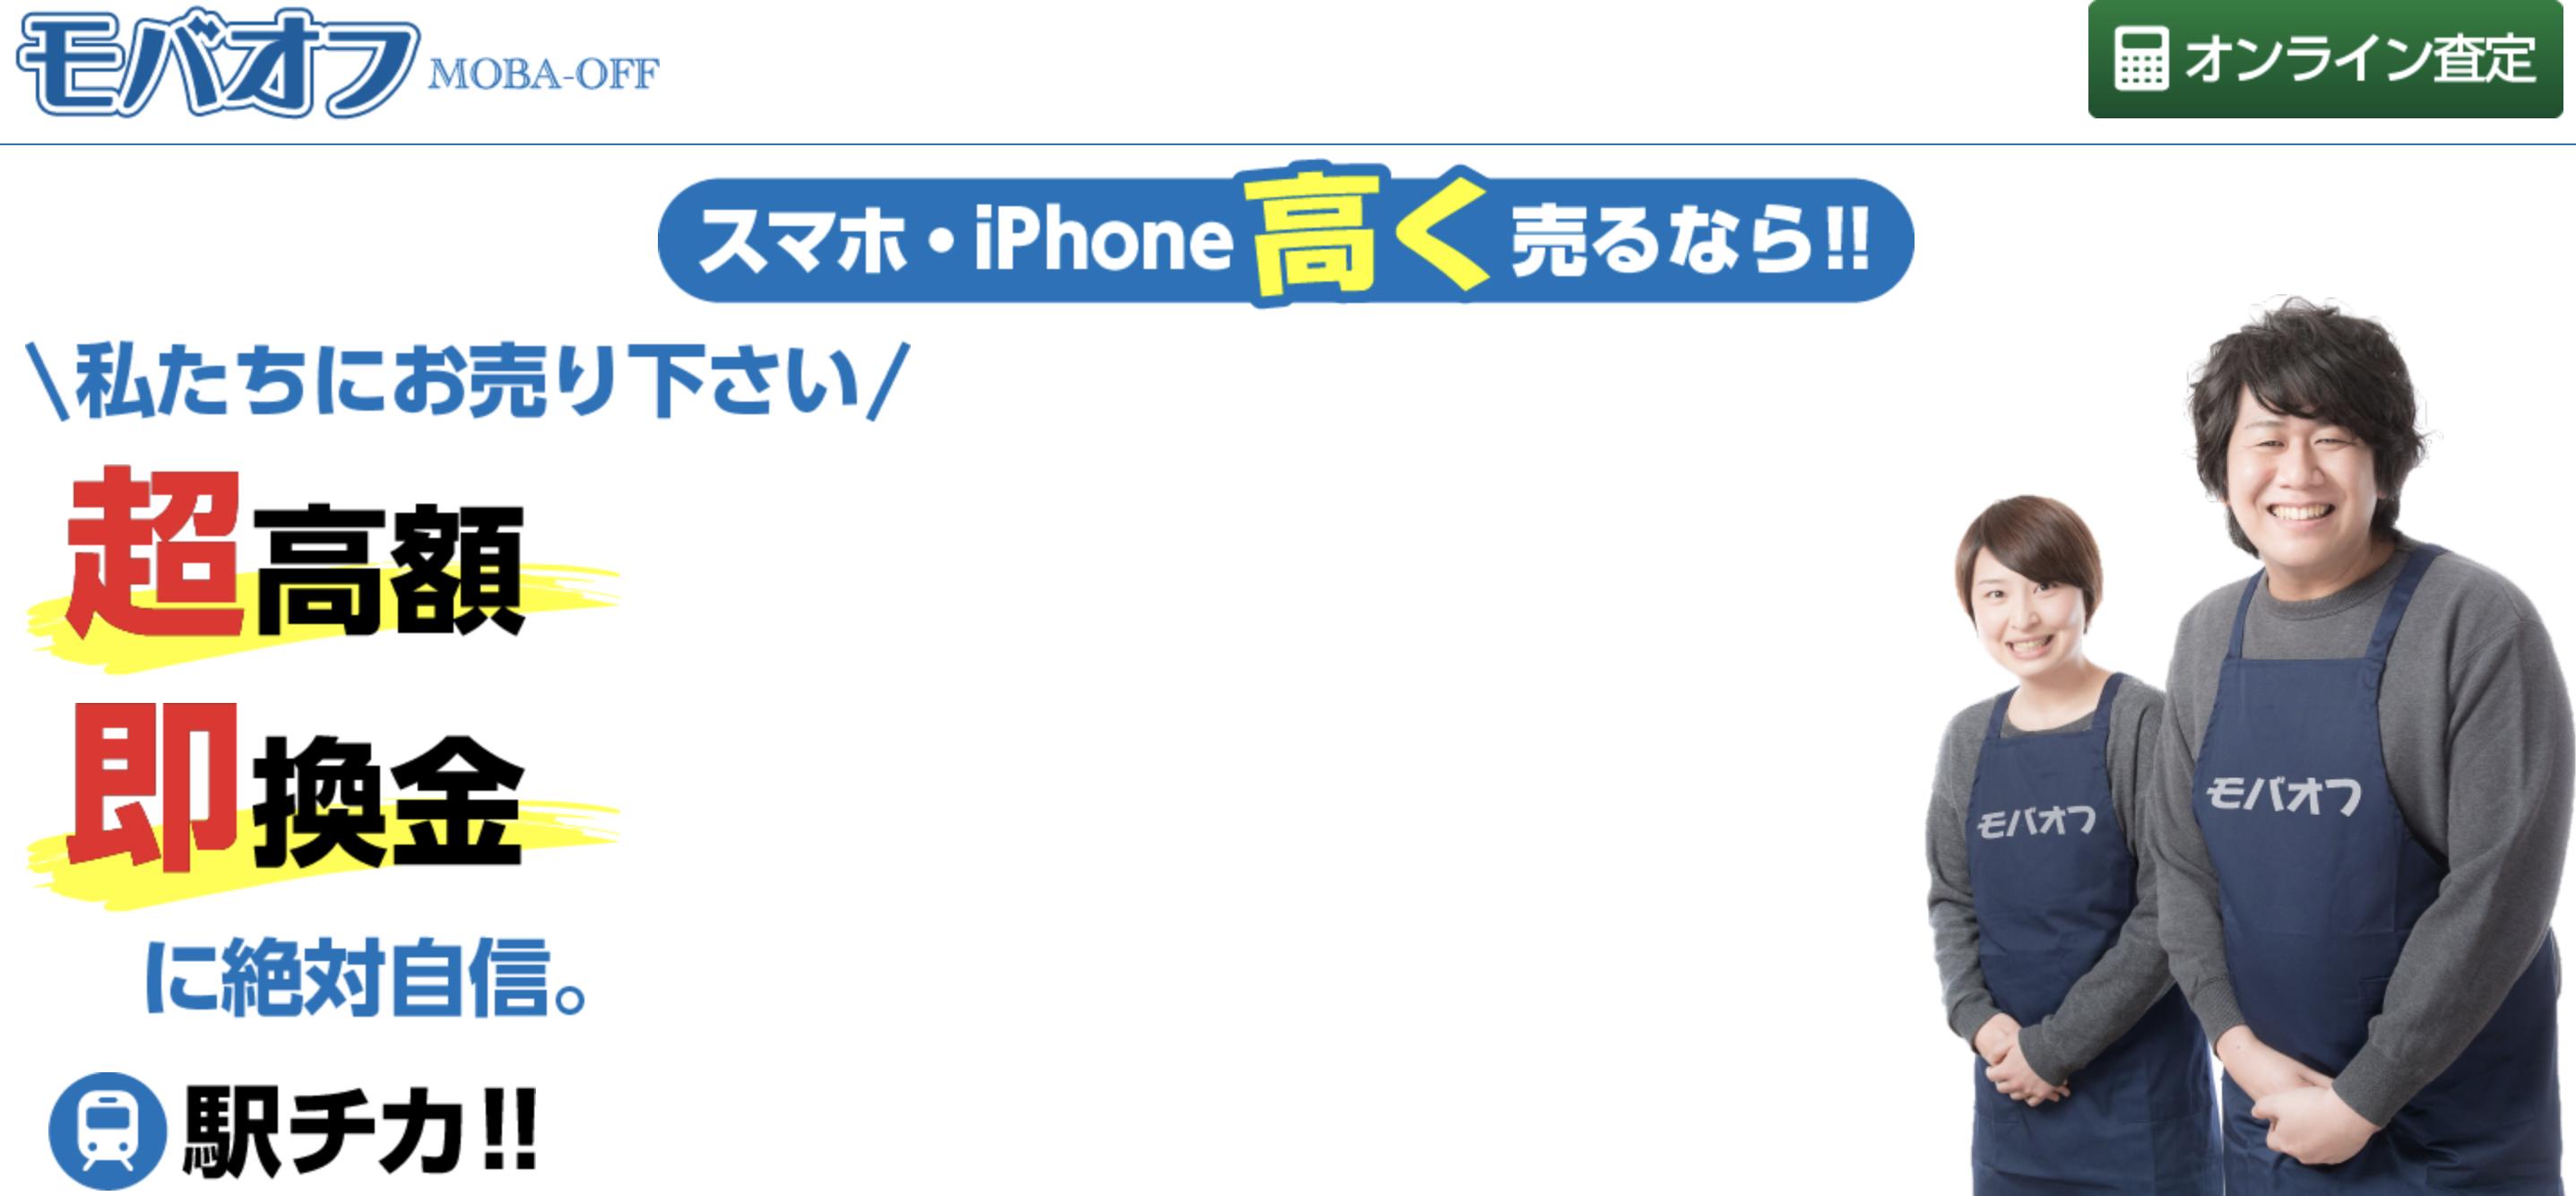 iPhone買取 モバオフ渋谷